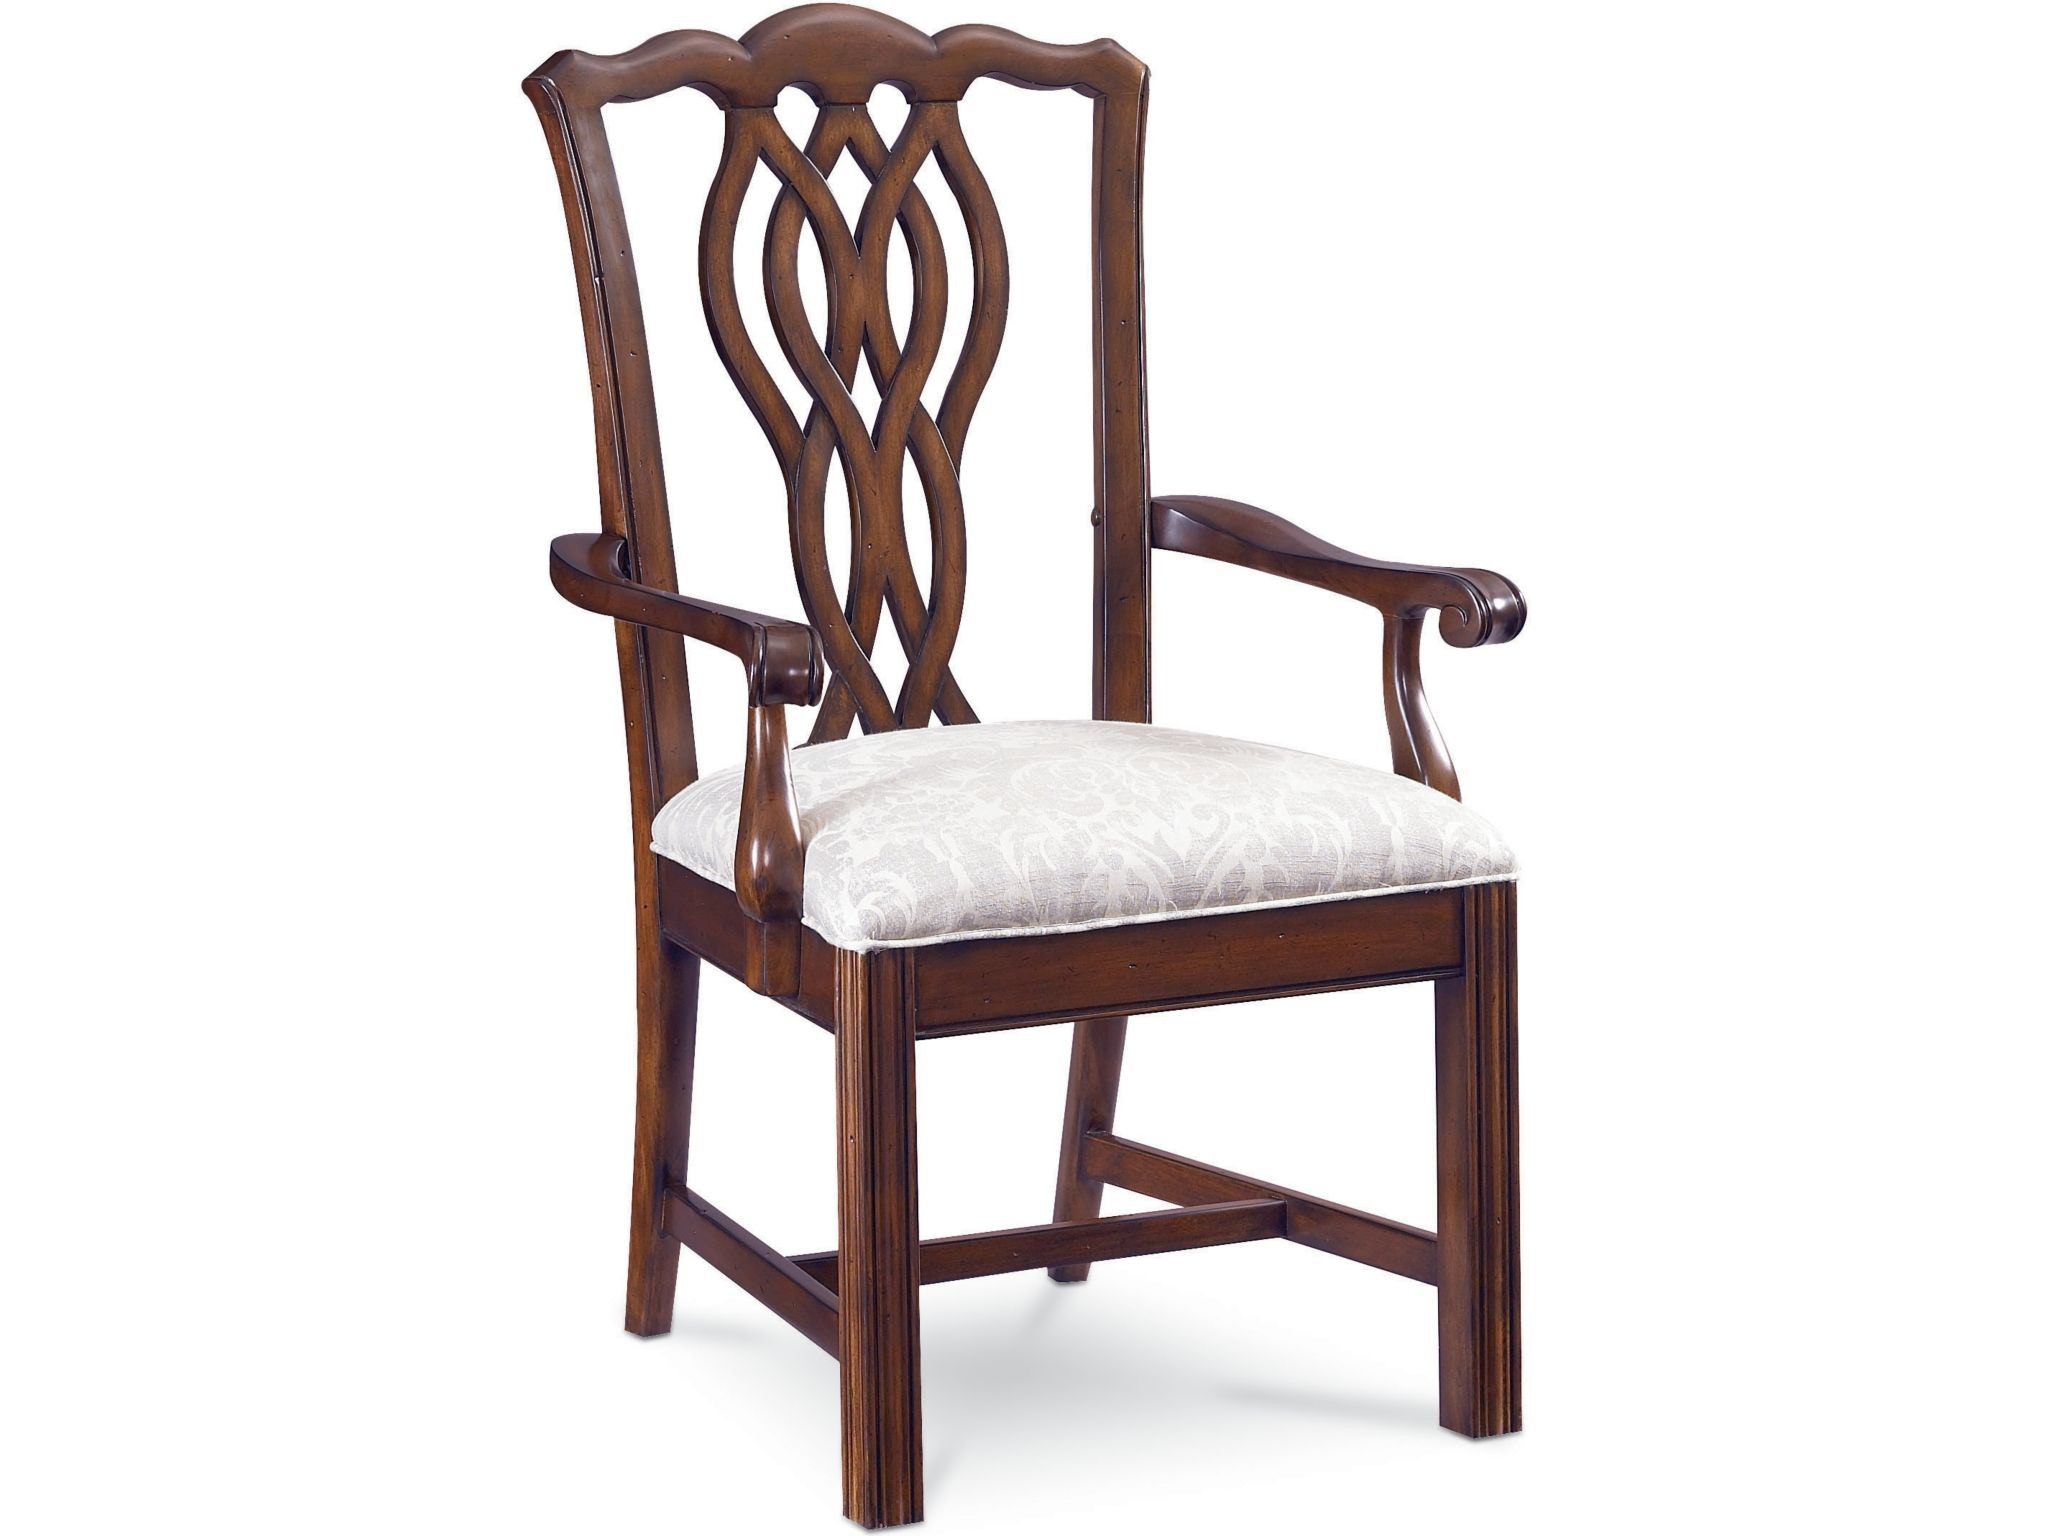 Thomasville Arm Chair 46821 822